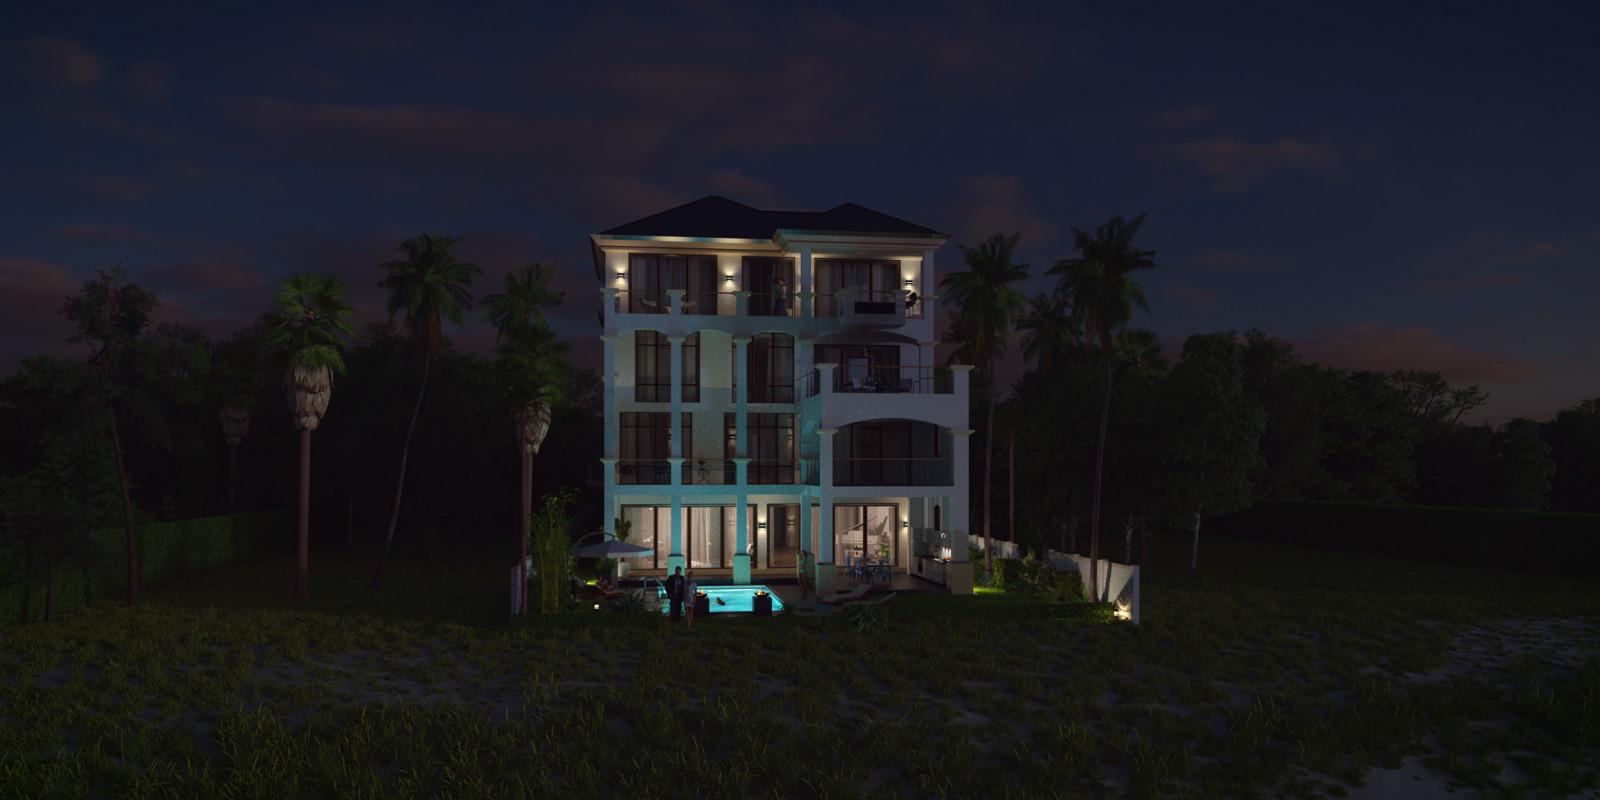 SketchUp + Thea Render  Seagrove Beach House: Scene 51 b 2pt Night B Lumina 2160 × 1080 Presto MC Bucket